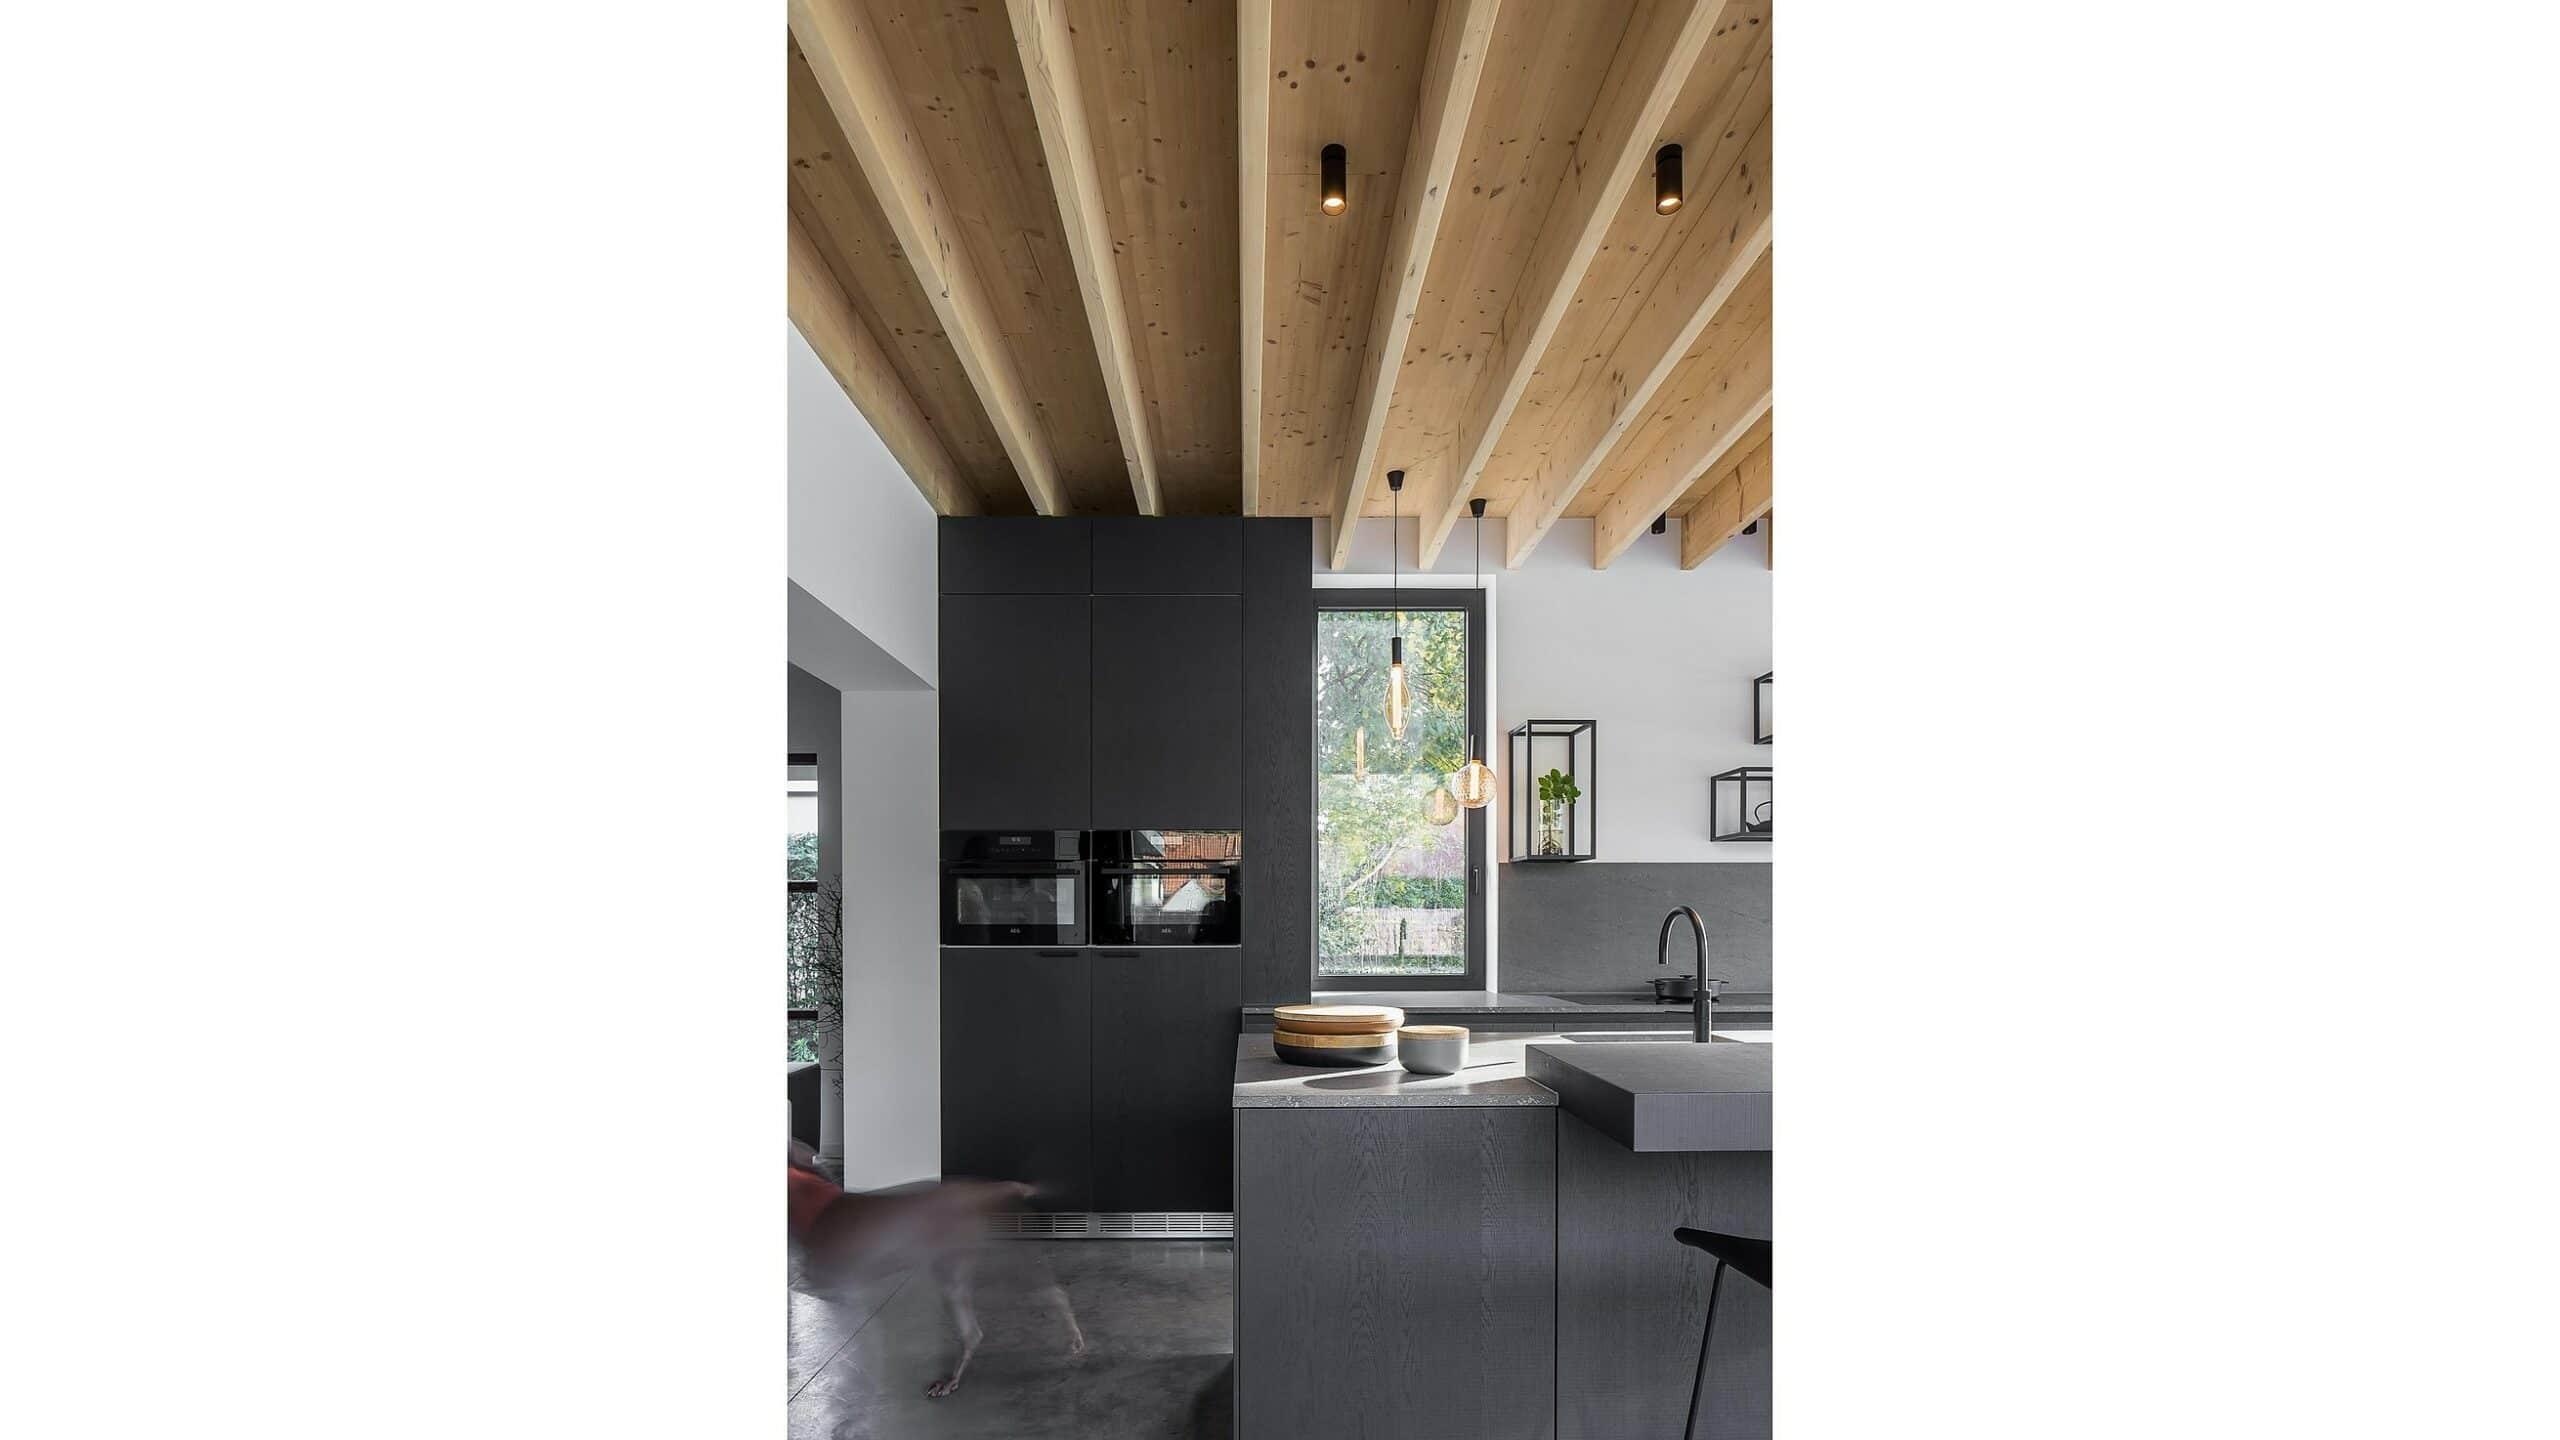 csm bulthaup ligna recta cafeine black oak 08 a84040490c scaled | Baeyens & Beck architecten Gent | architect nieuwbouw renovatie interieur | high end | architectenbureau